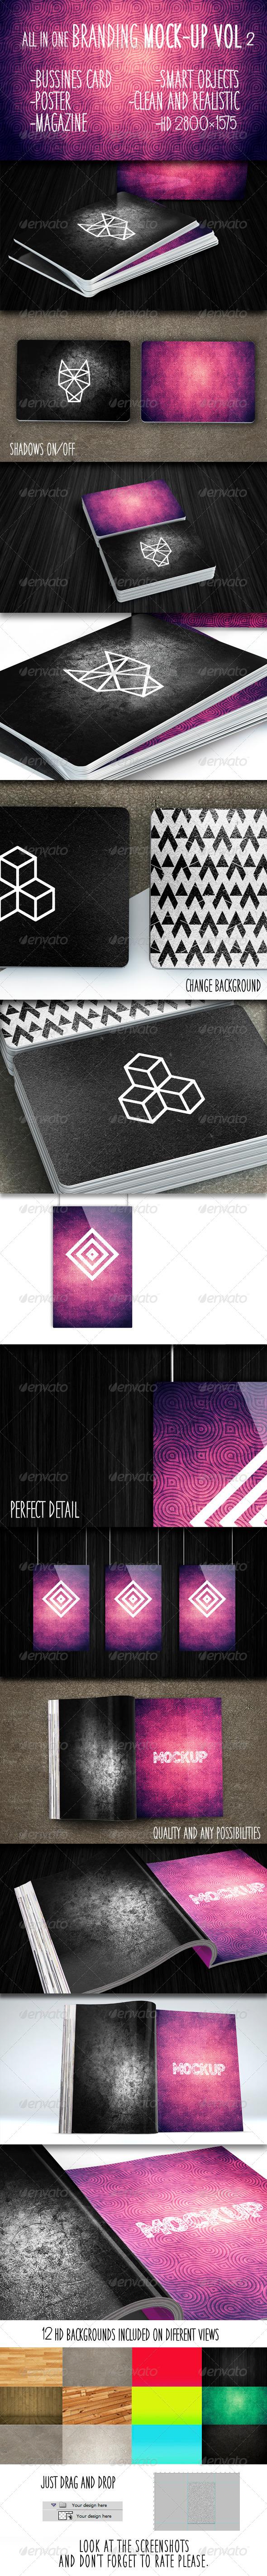 GraphicRiver Branding Mock-Up Vol 2 7885903